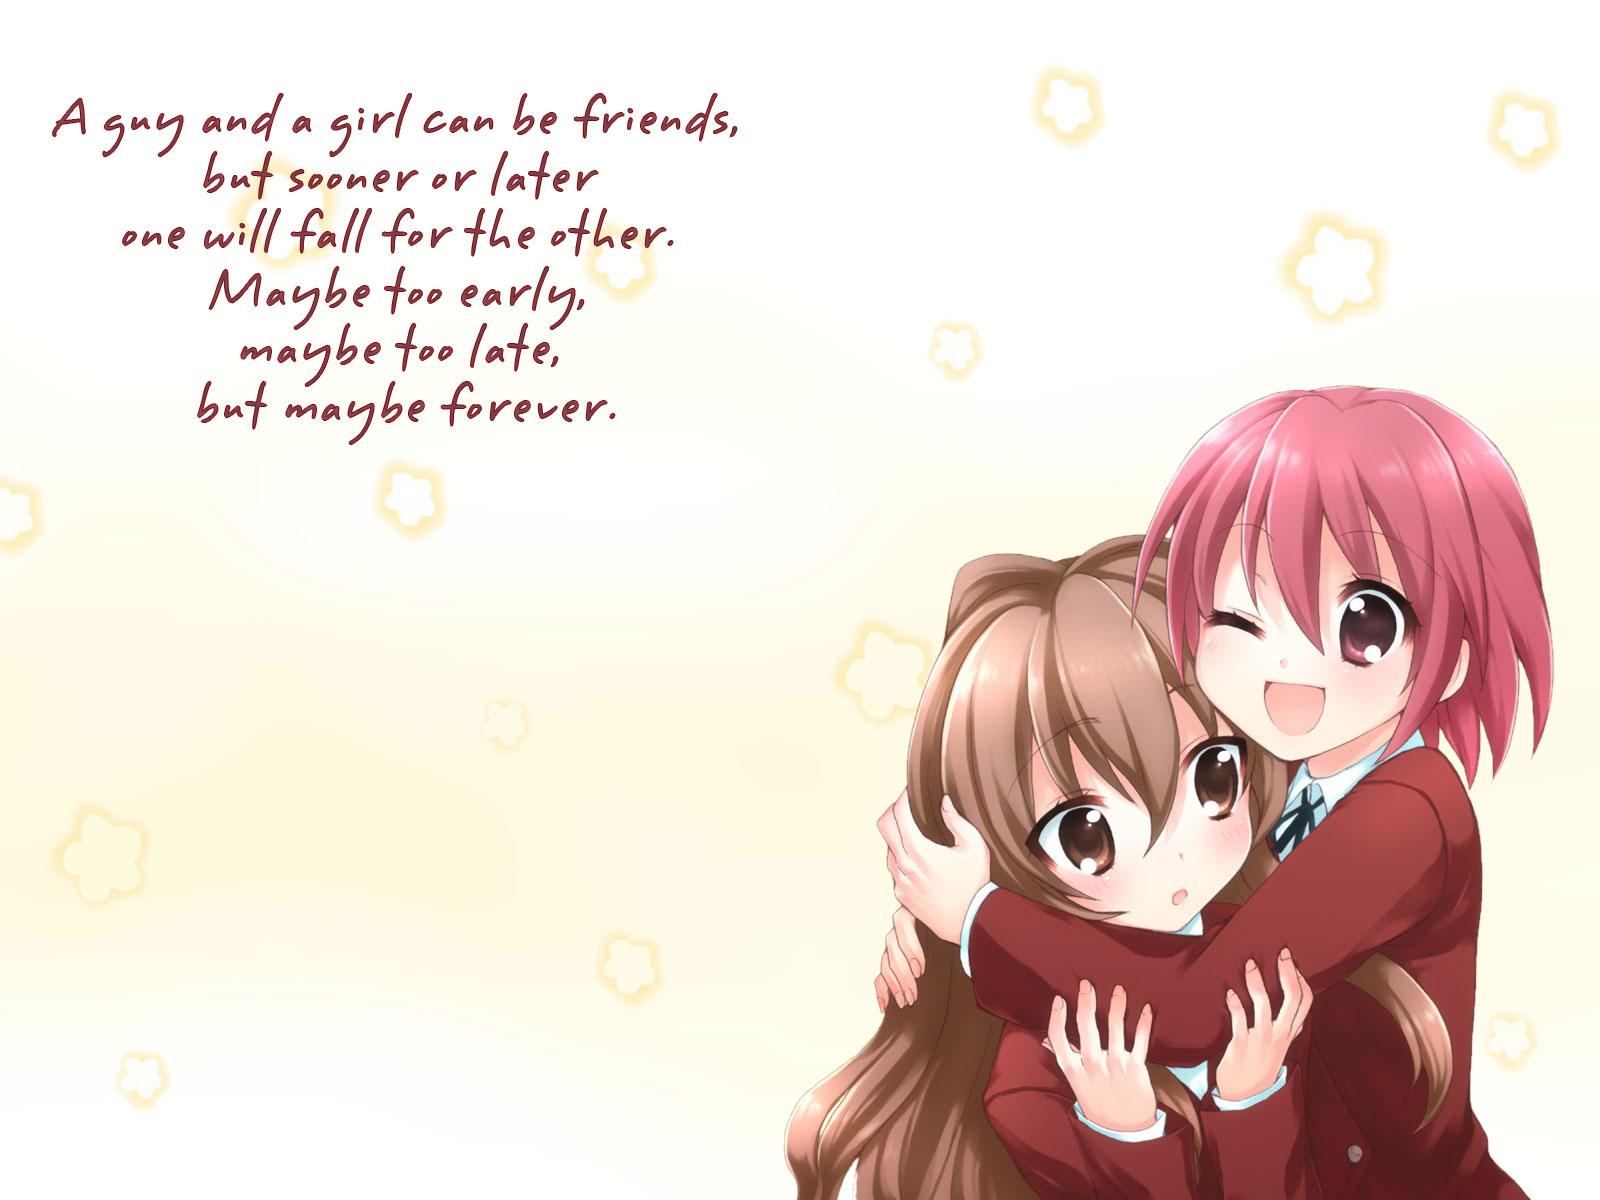 Two Anime Best Friends 1600x1200 Wallpaper Teahub Io